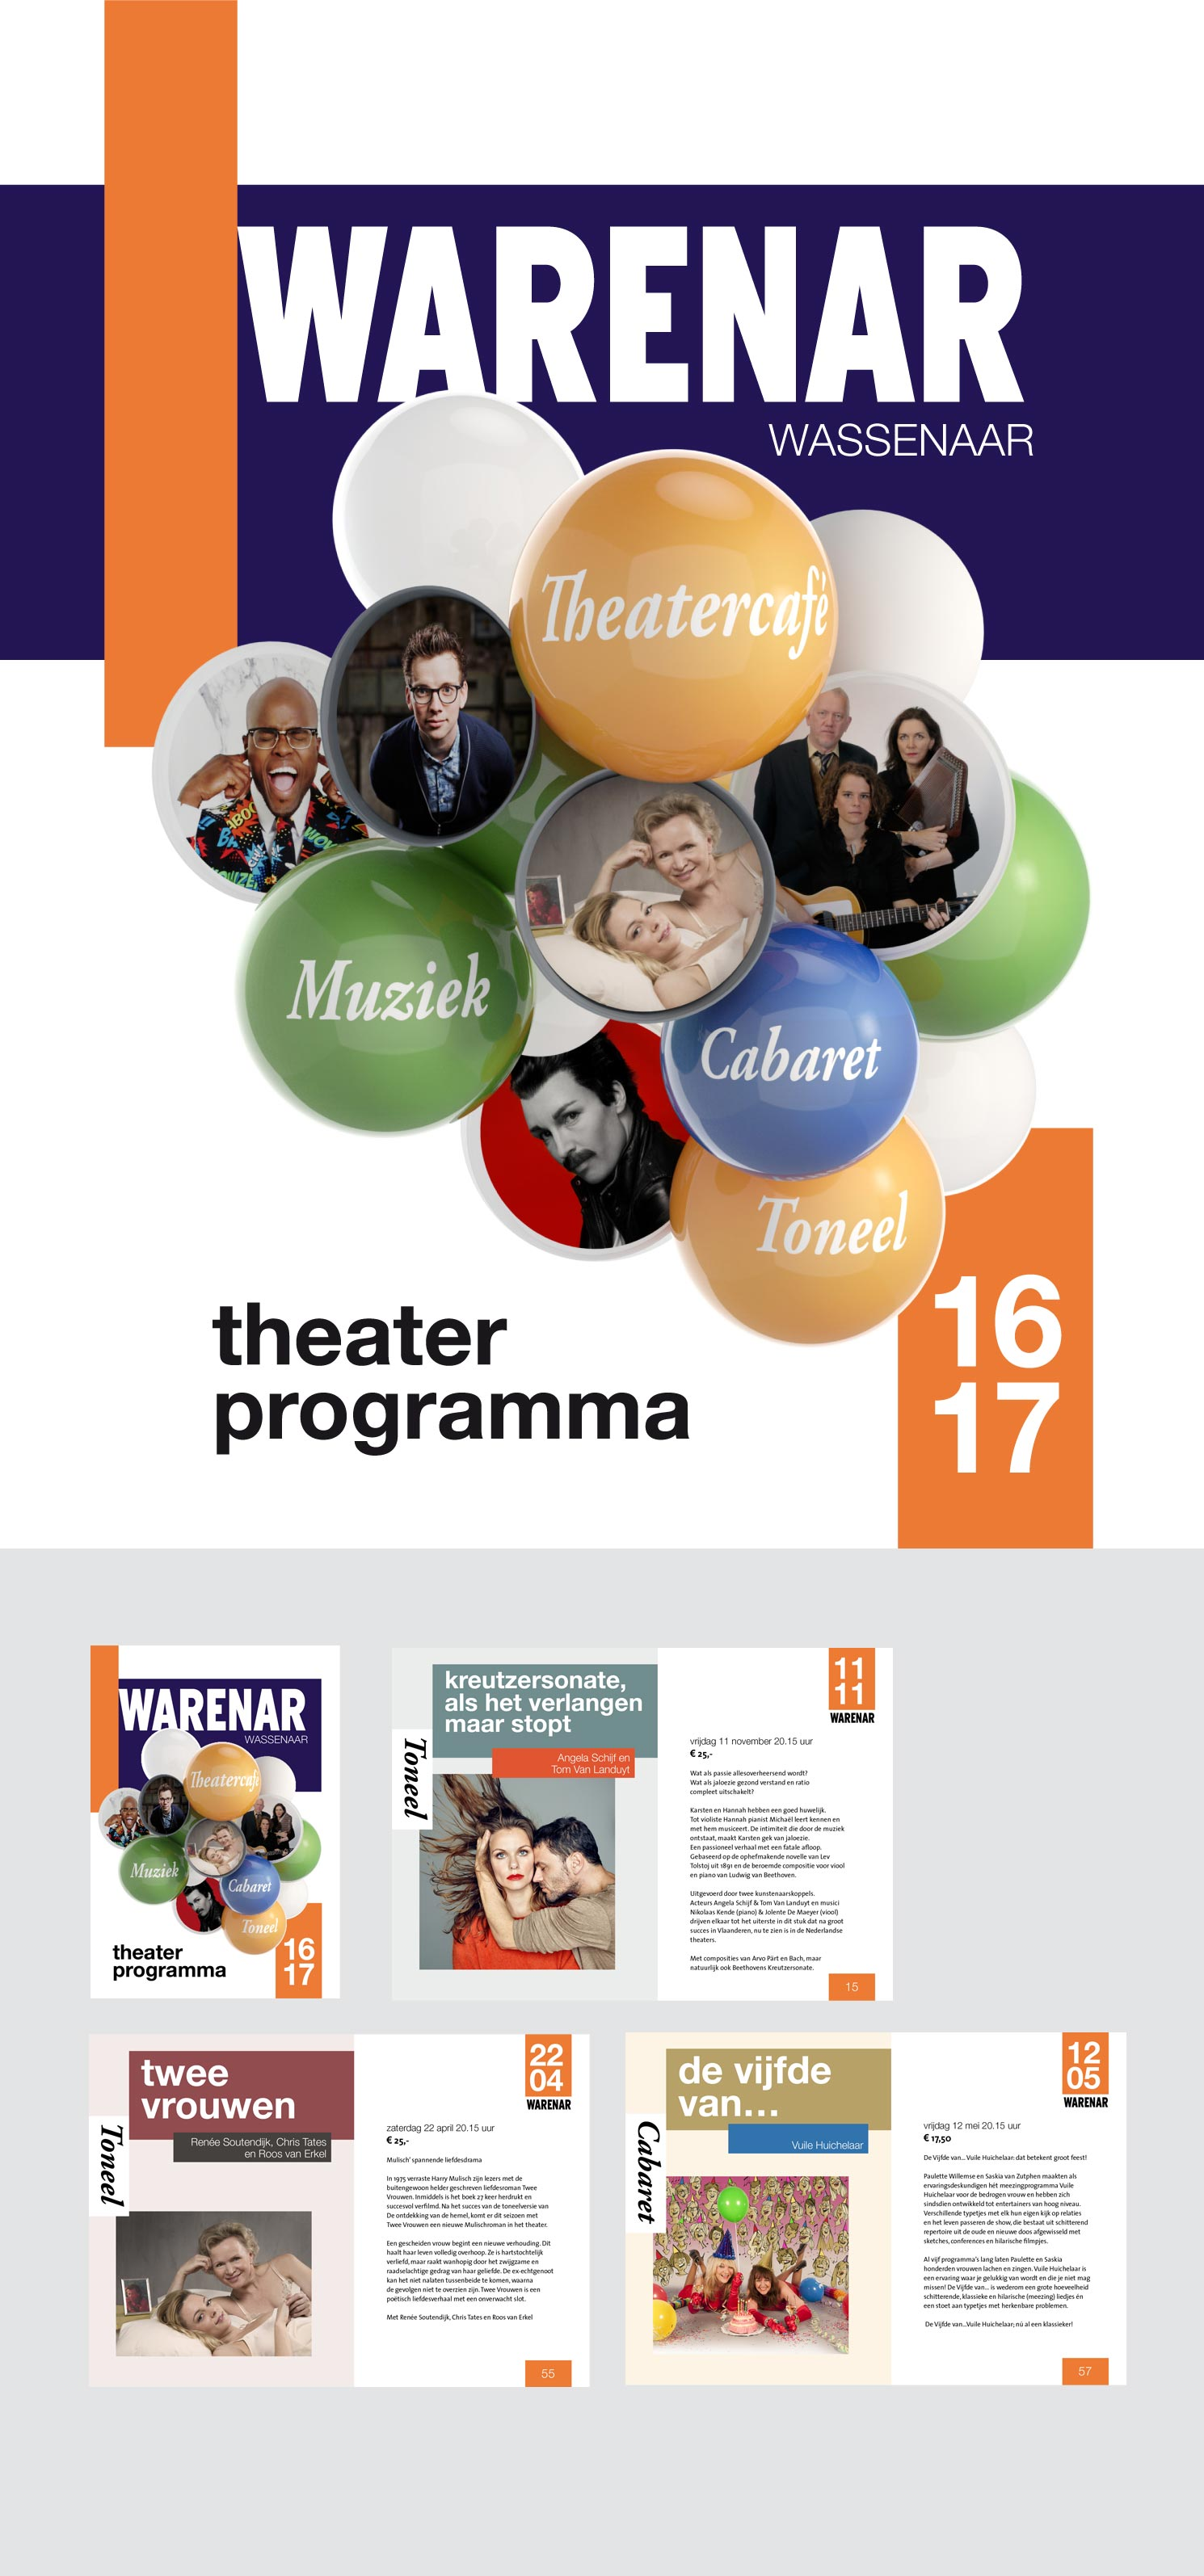 Theater programma Warenar